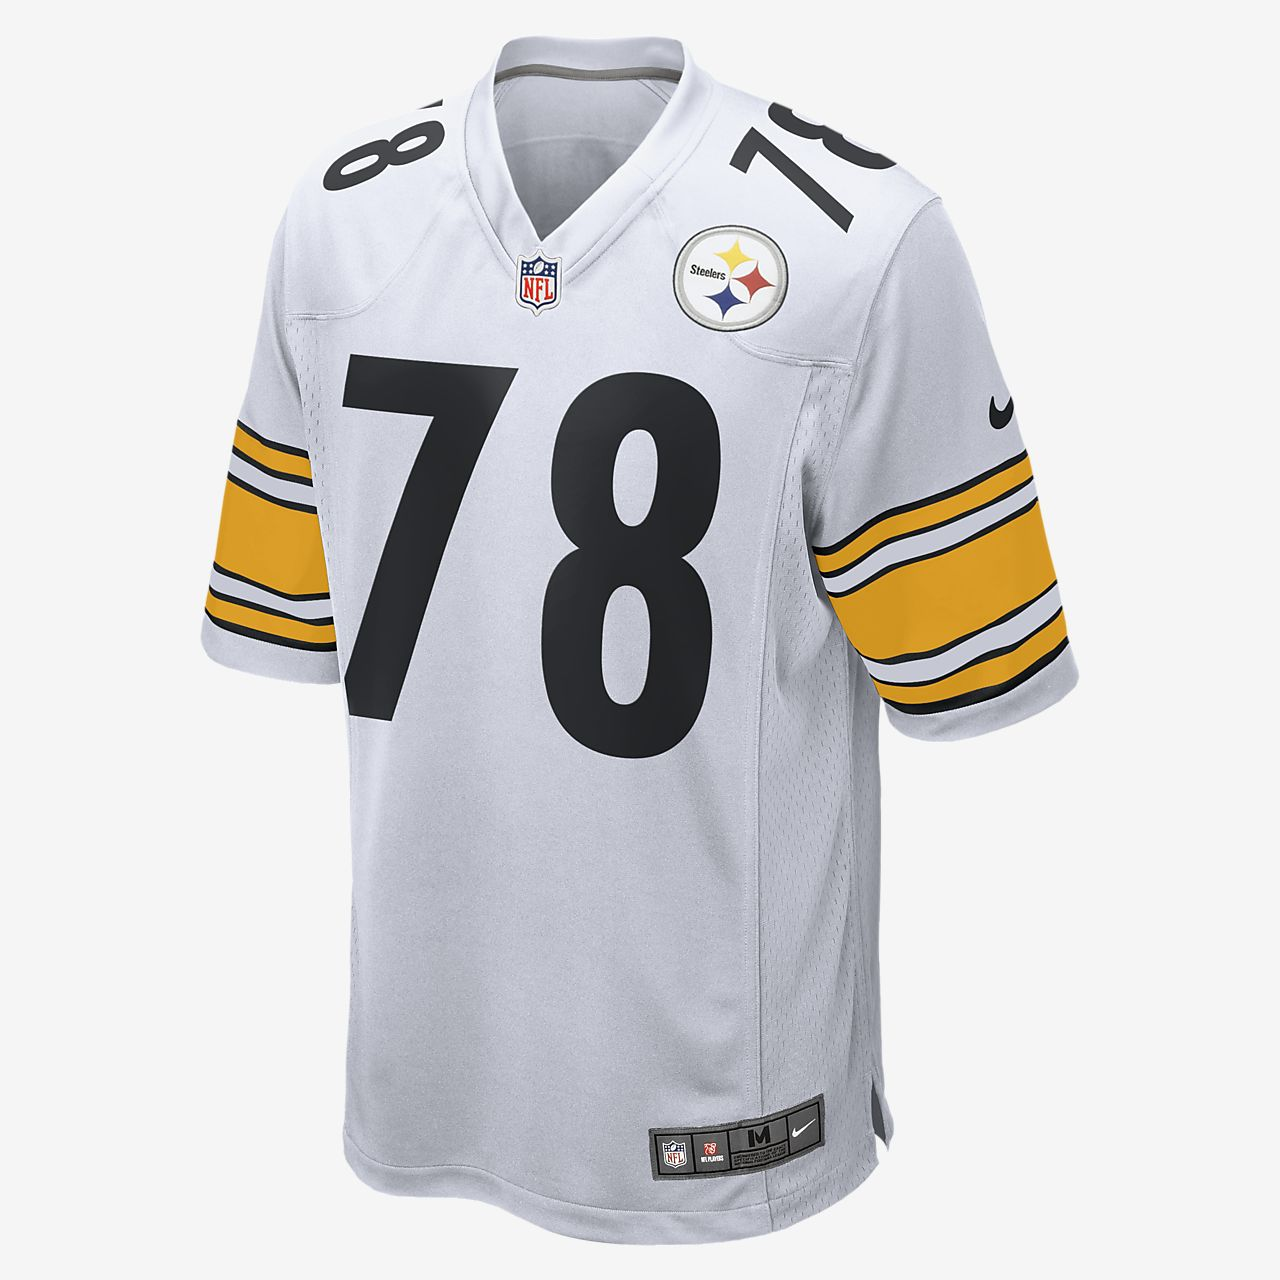 info for 9ef9c f2155 NFL Pittsburgh Steelers (Alejandro Villanueva) Men's Football Away Game  Jersey